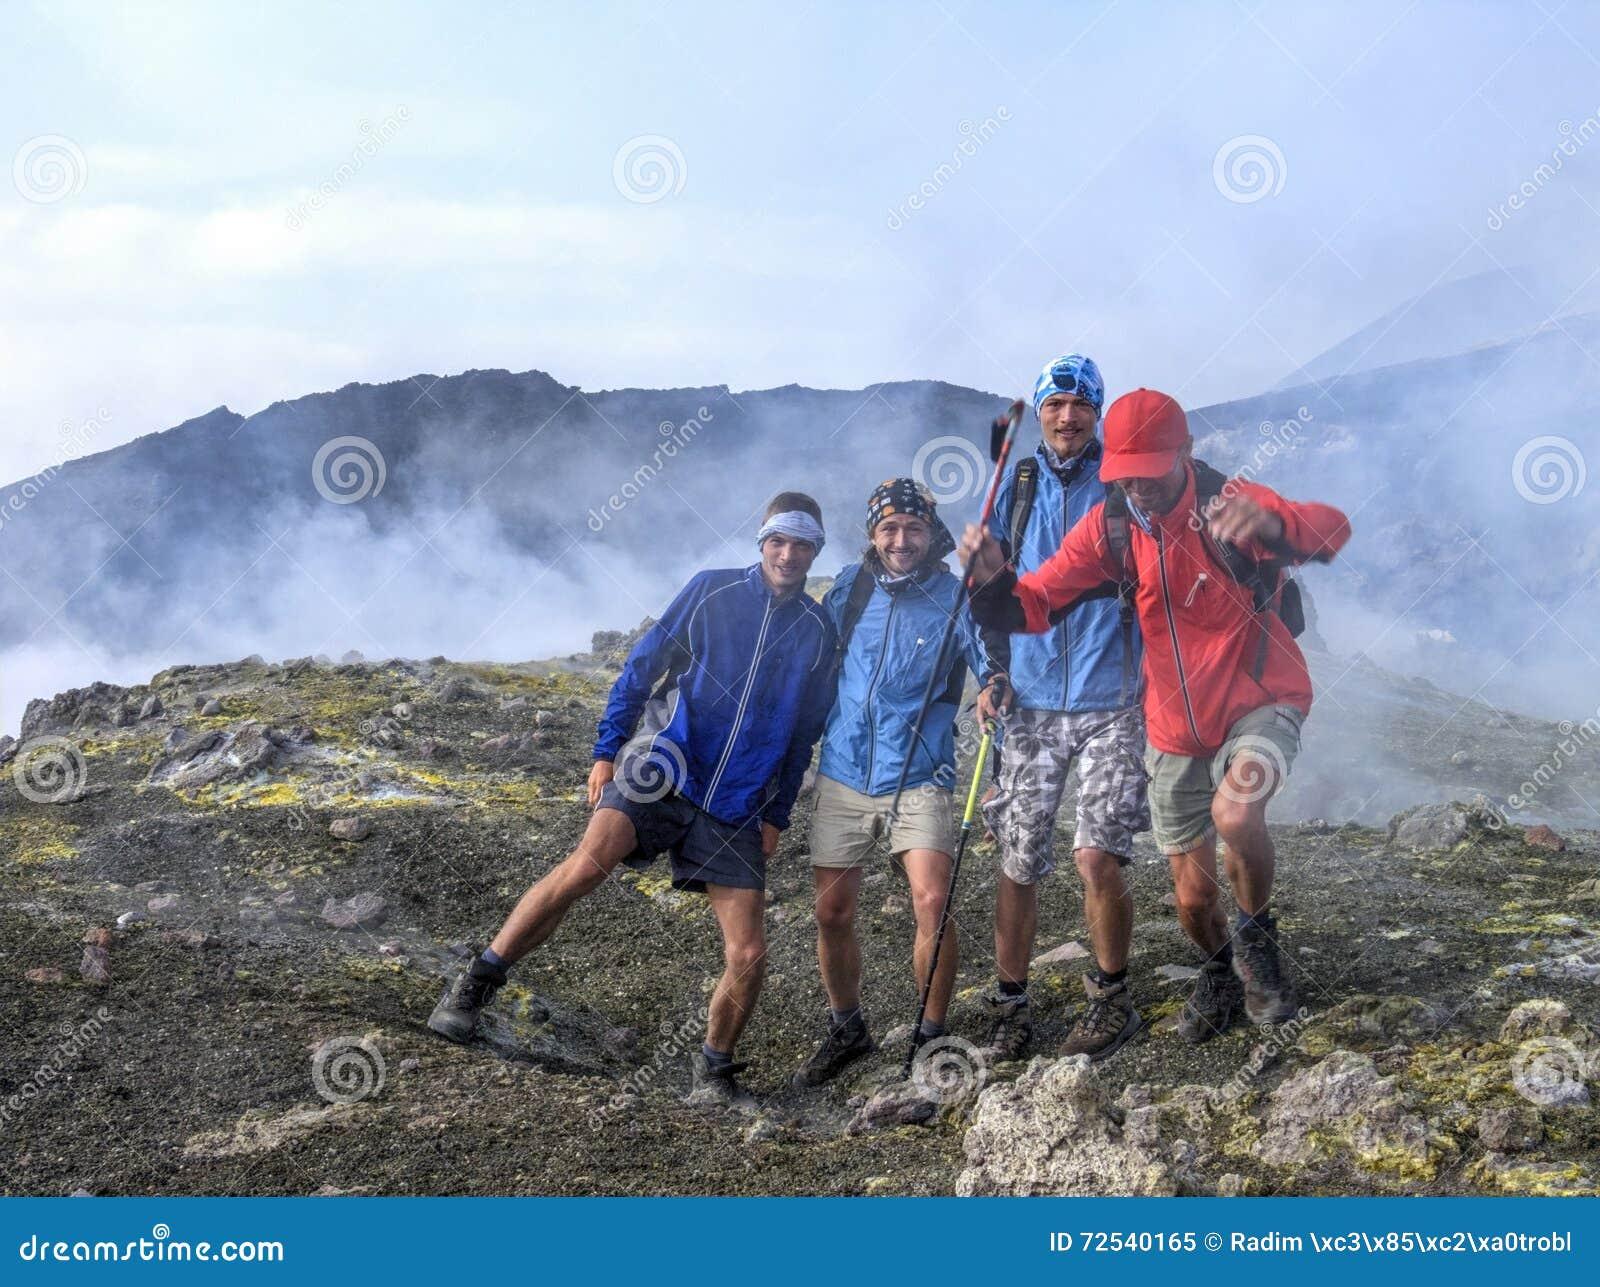 Фото на саммите Этна нарушило газом серы